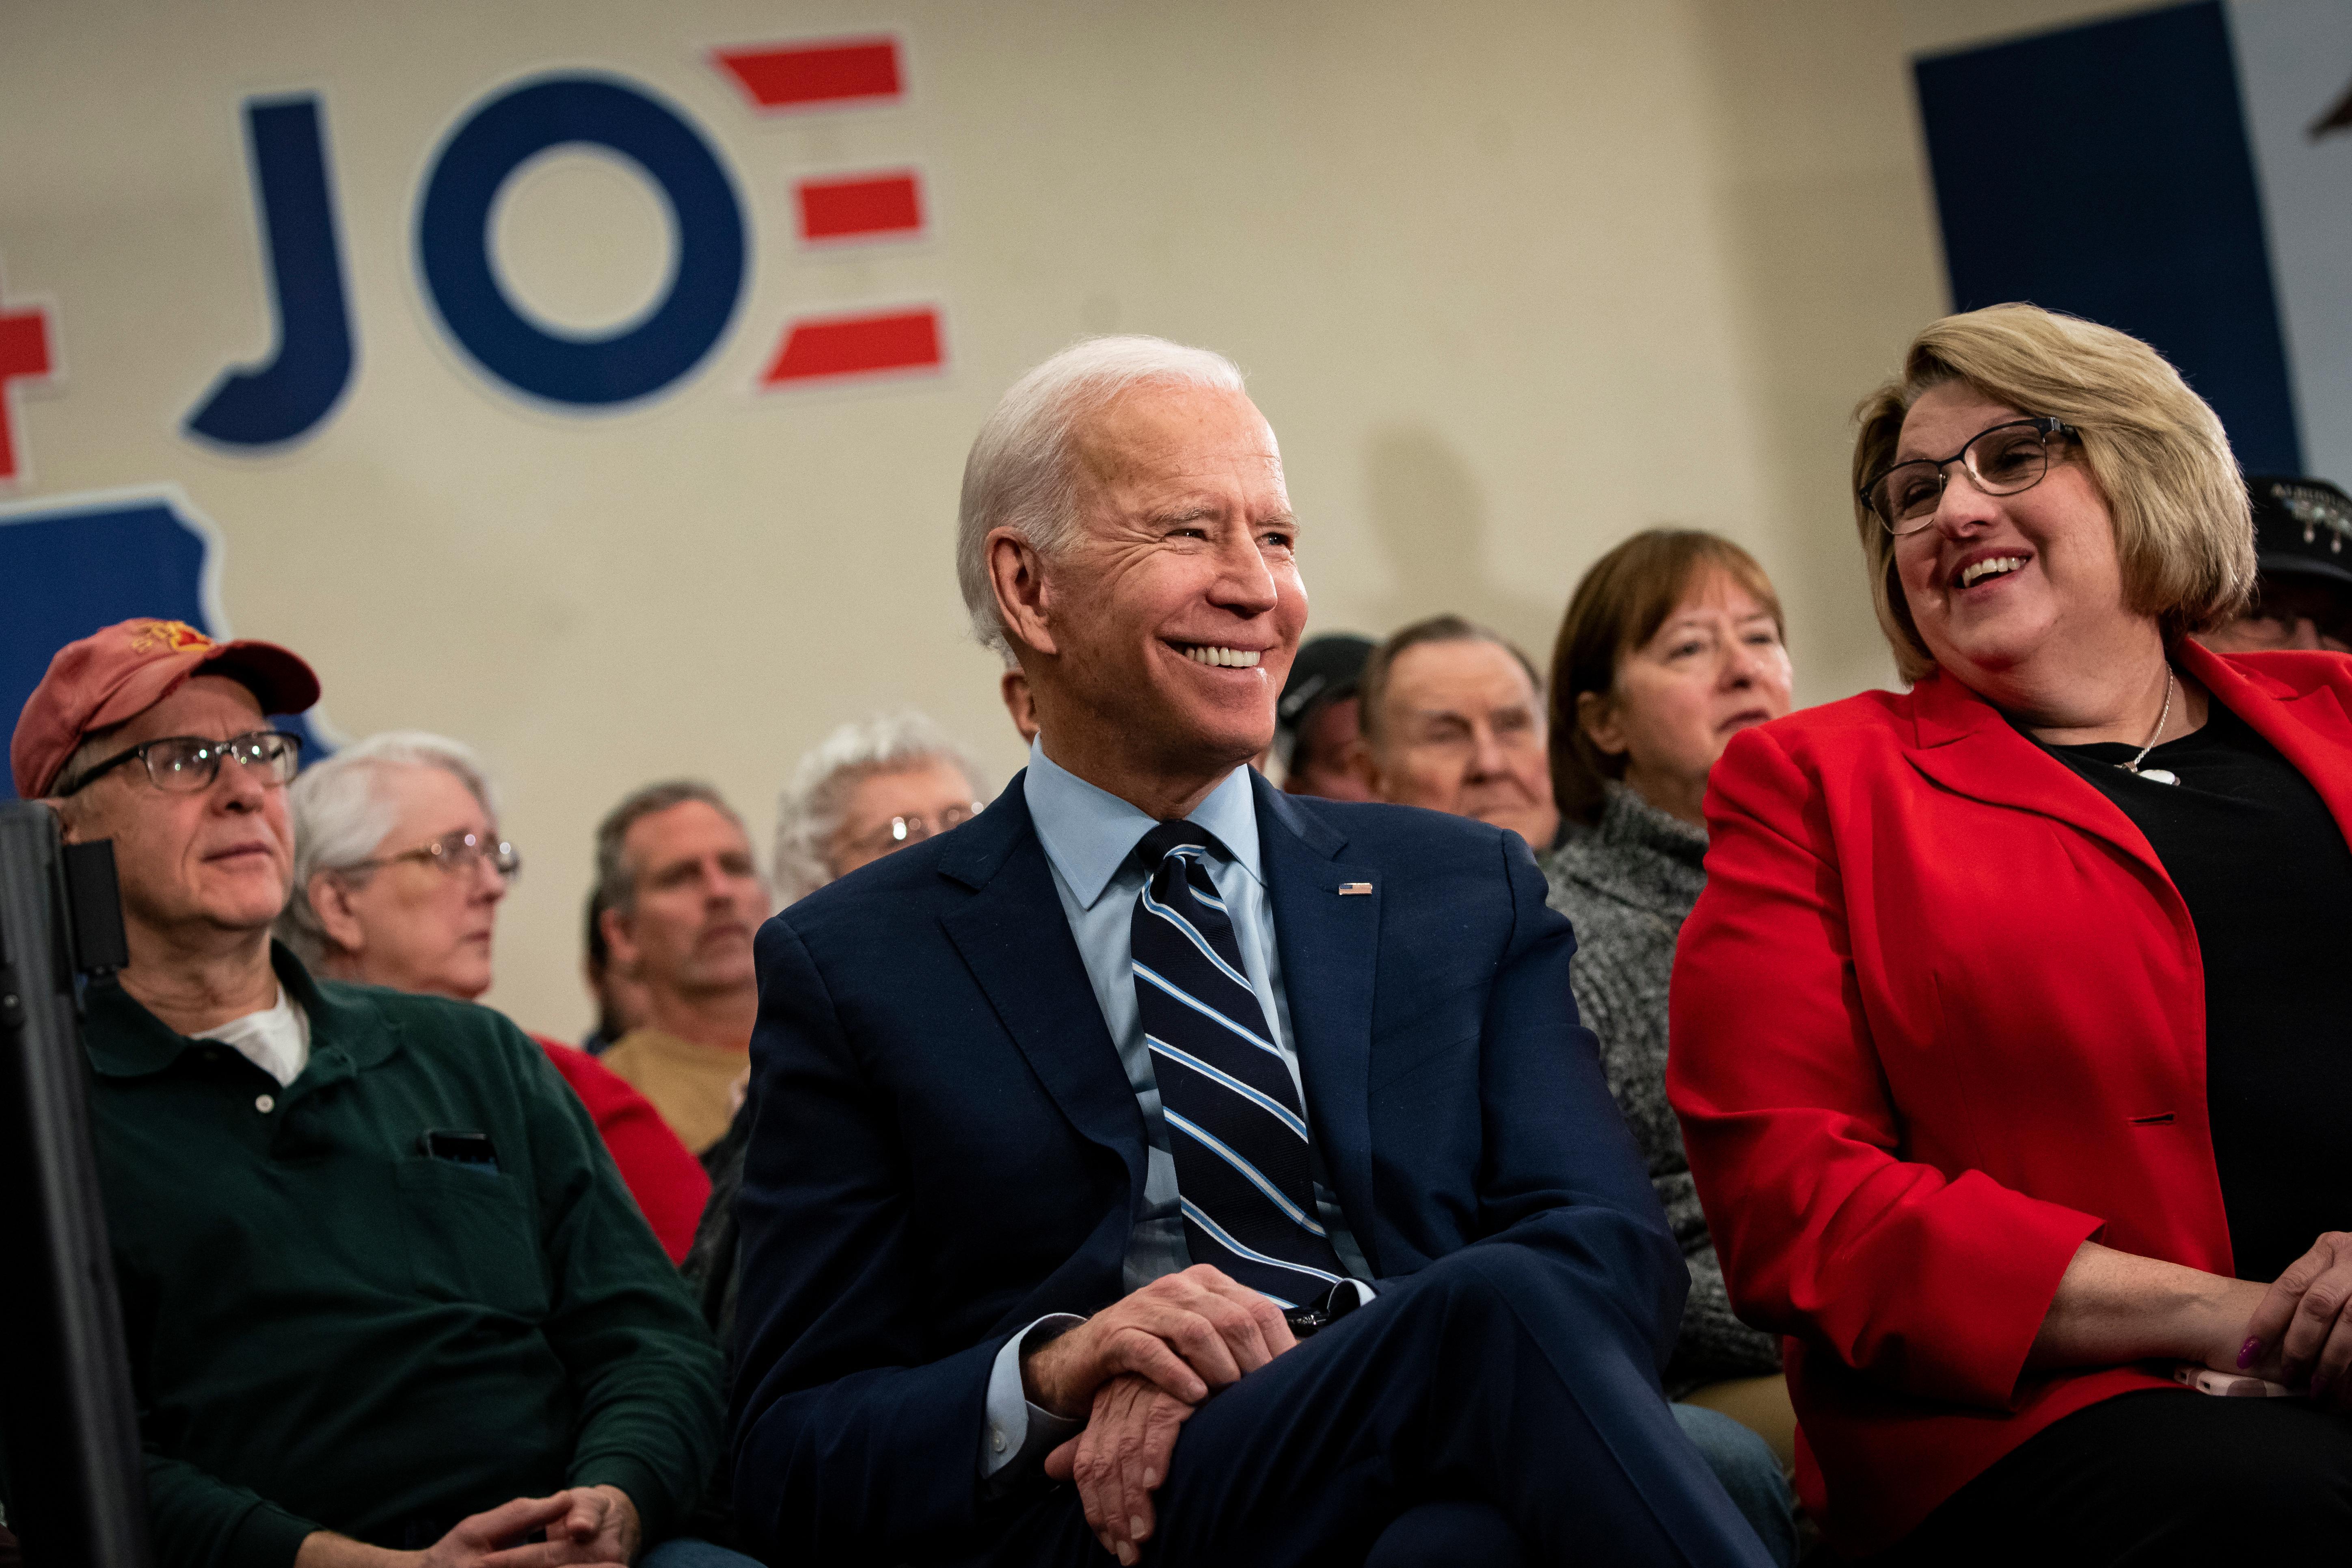 Could Joe Biden lose Iowa but win the Democratic nomination?